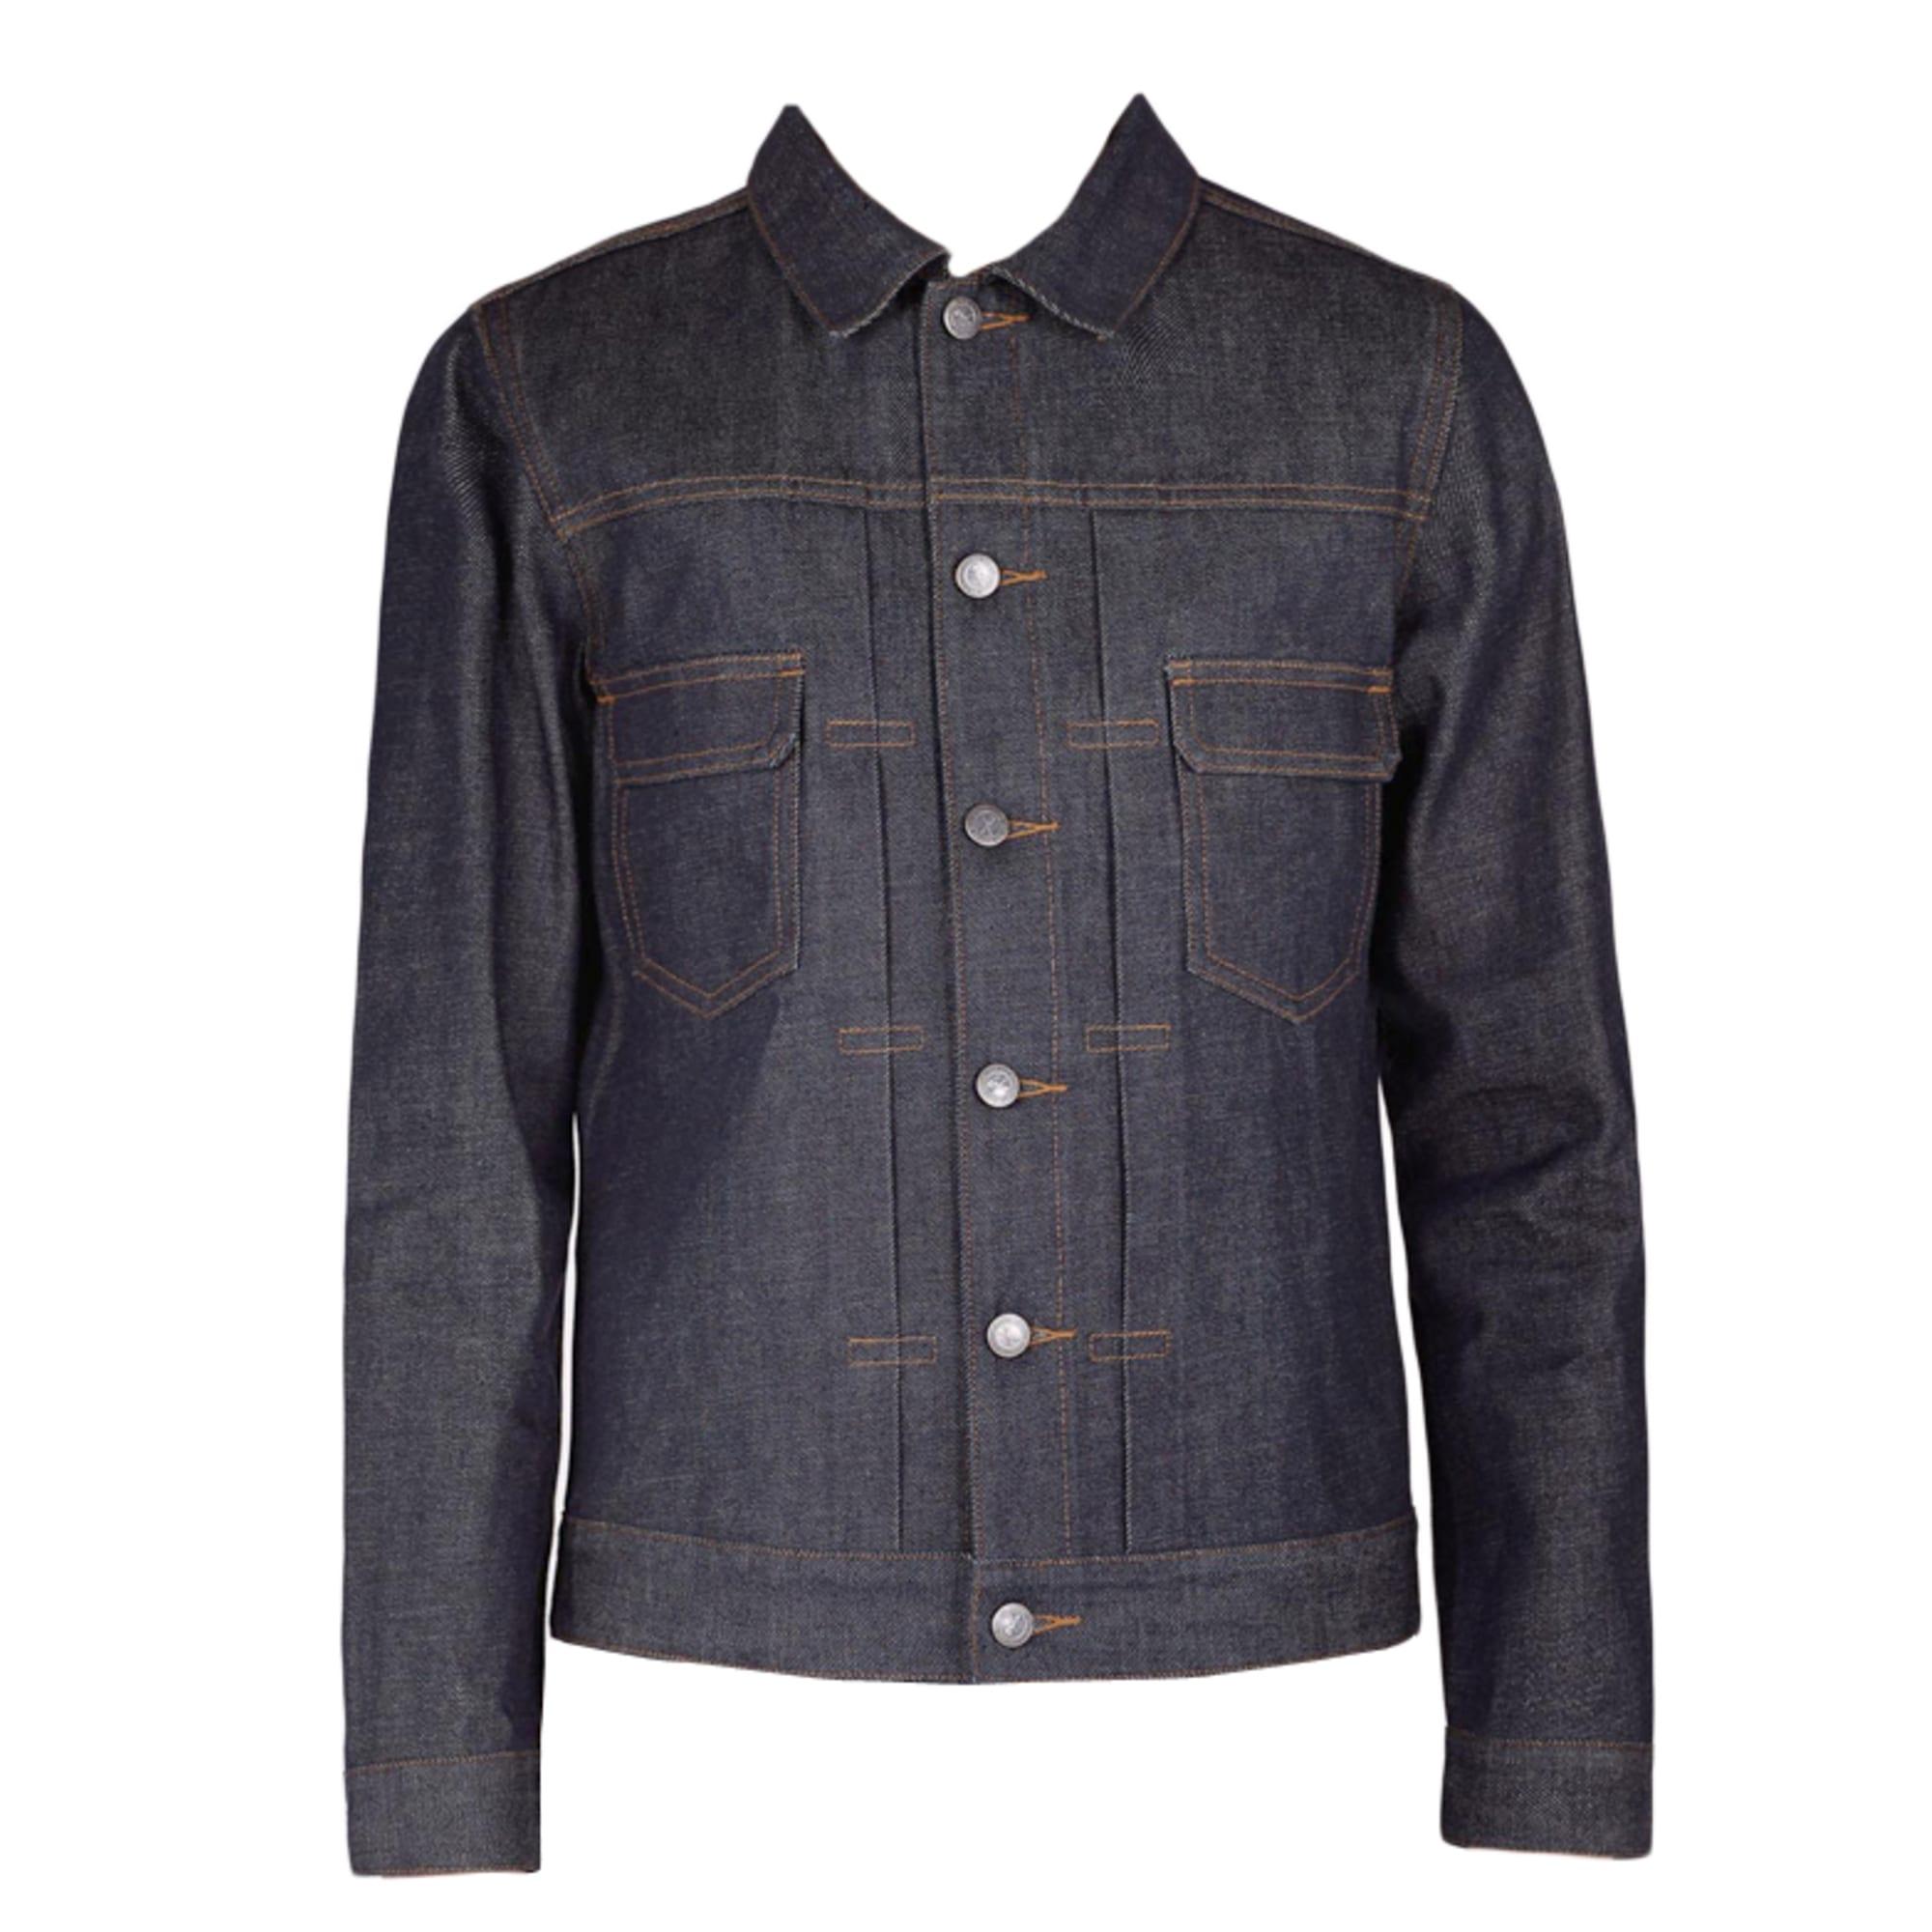 5ba22738db1a Veste en jean APC 50 (M) indigo vendu par Pure246602 - 3862168